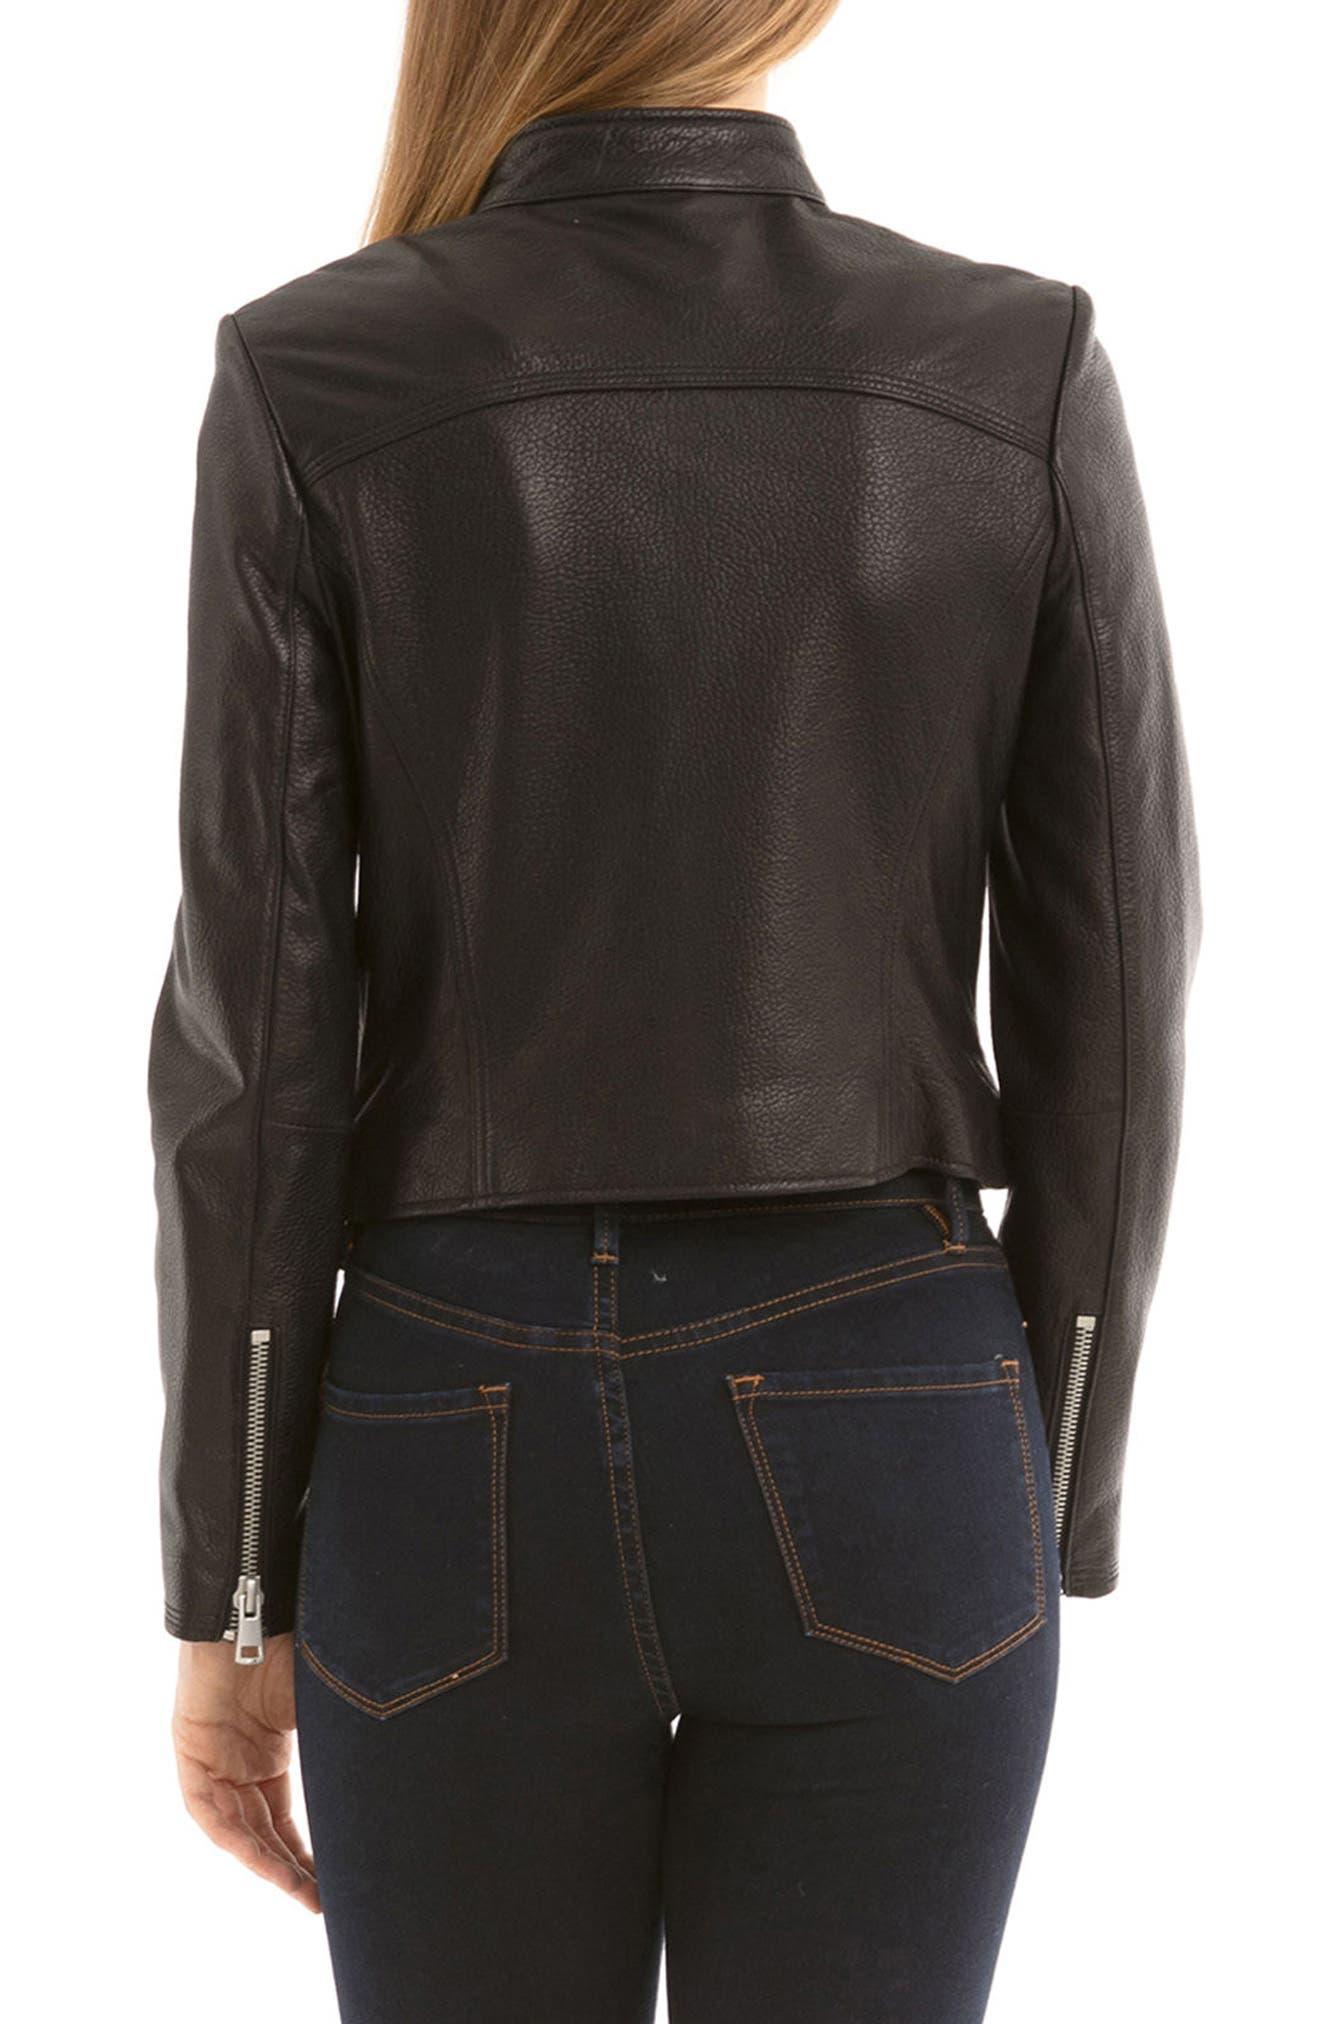 Bagatelle Textured Leather Jacket,                             Alternate thumbnail 2, color,                             001